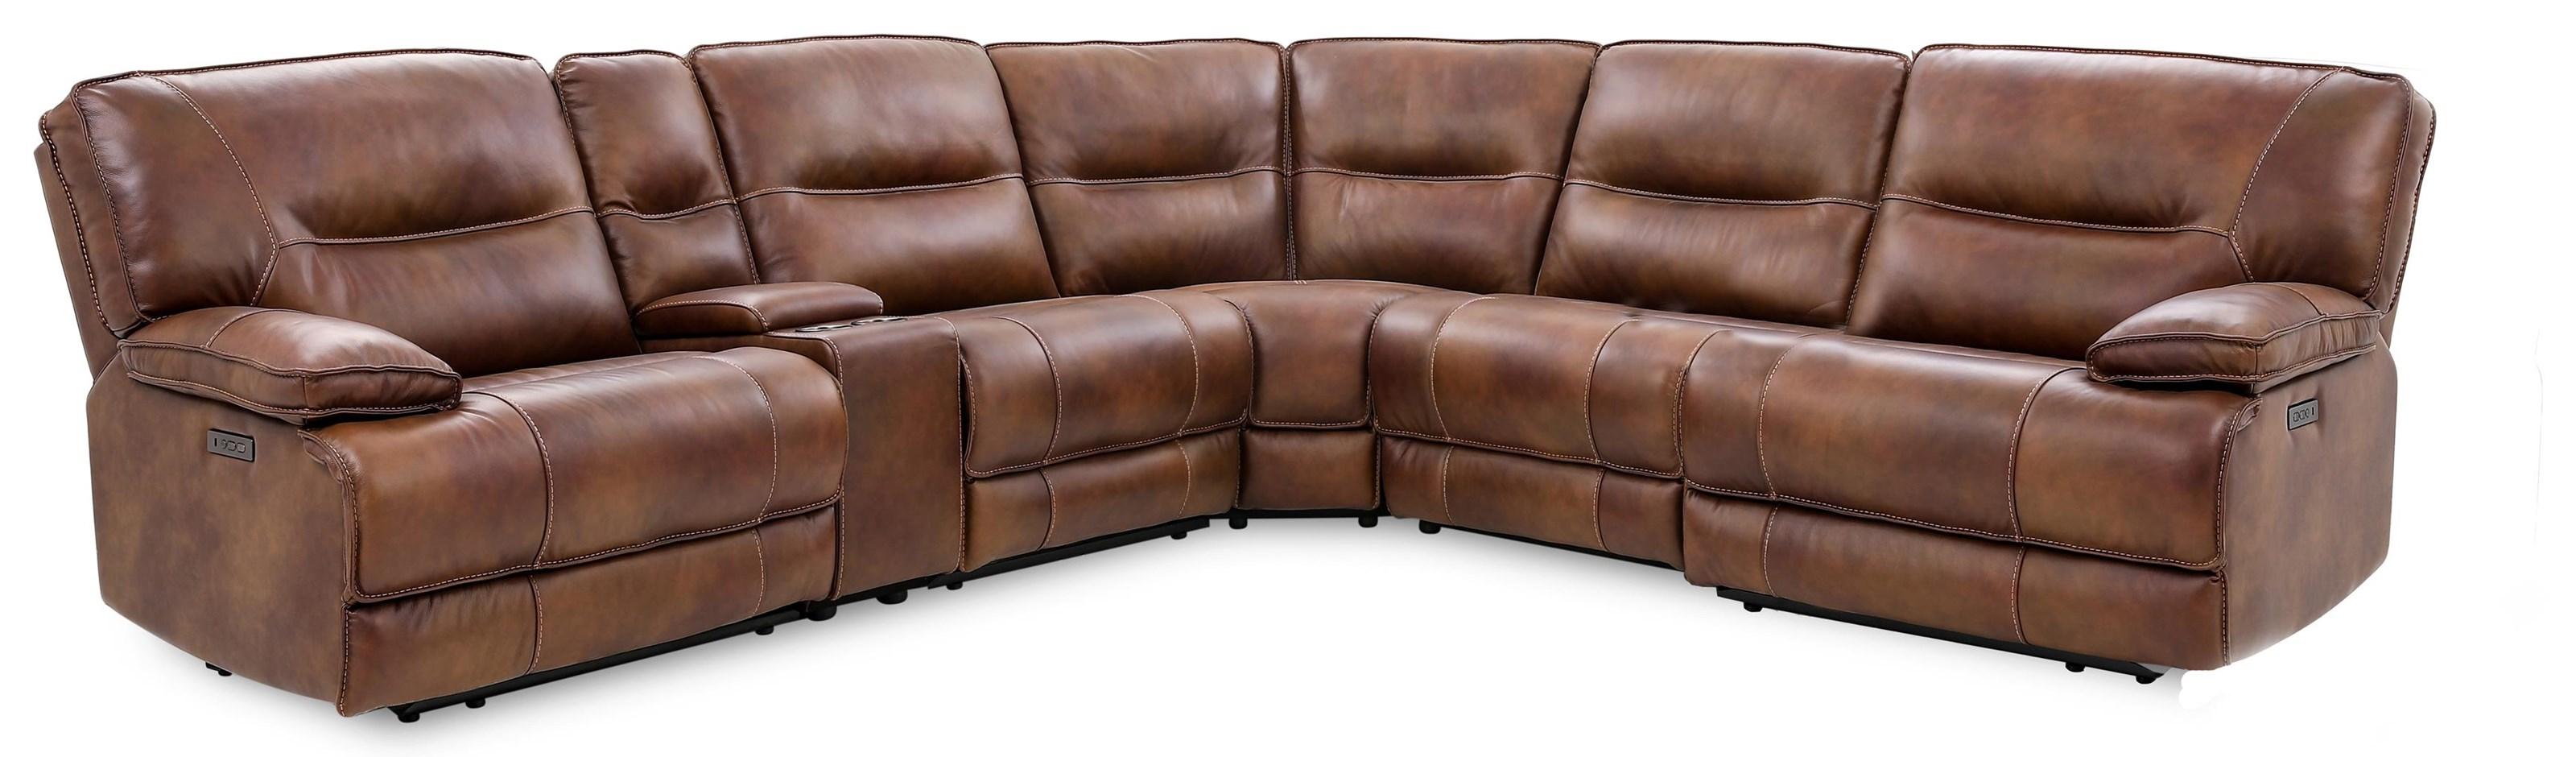 6-Piece Power Reclining Sectional Sofa